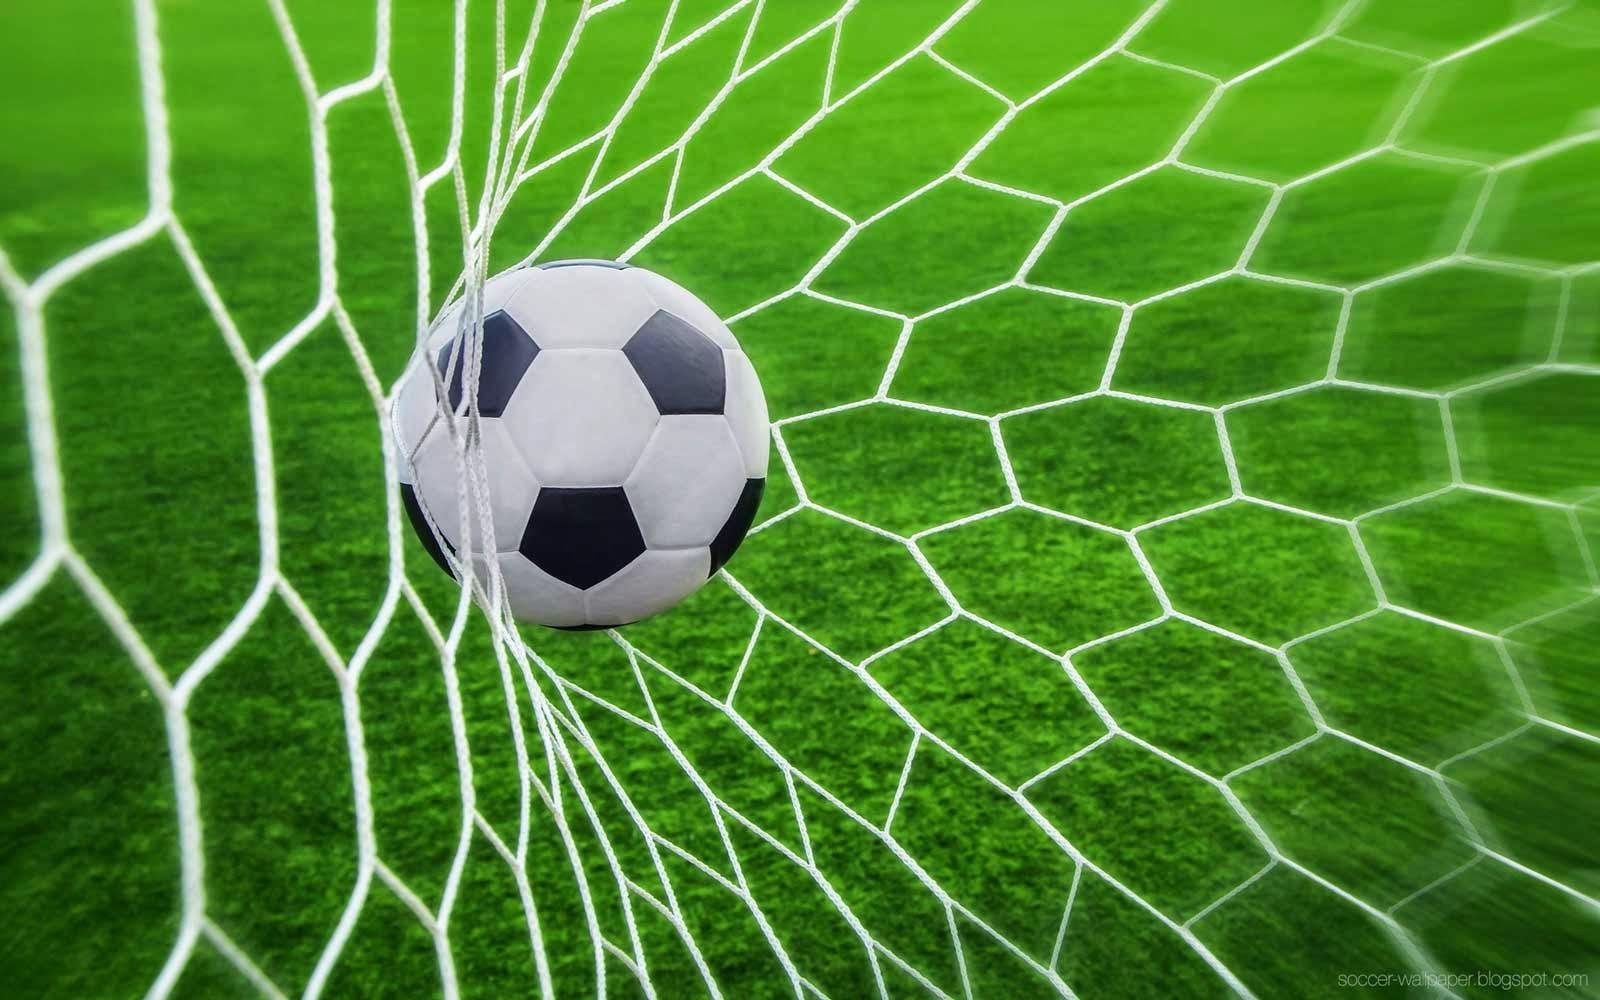 77+] Us Soccer Wallpaper on WallpaperSafari